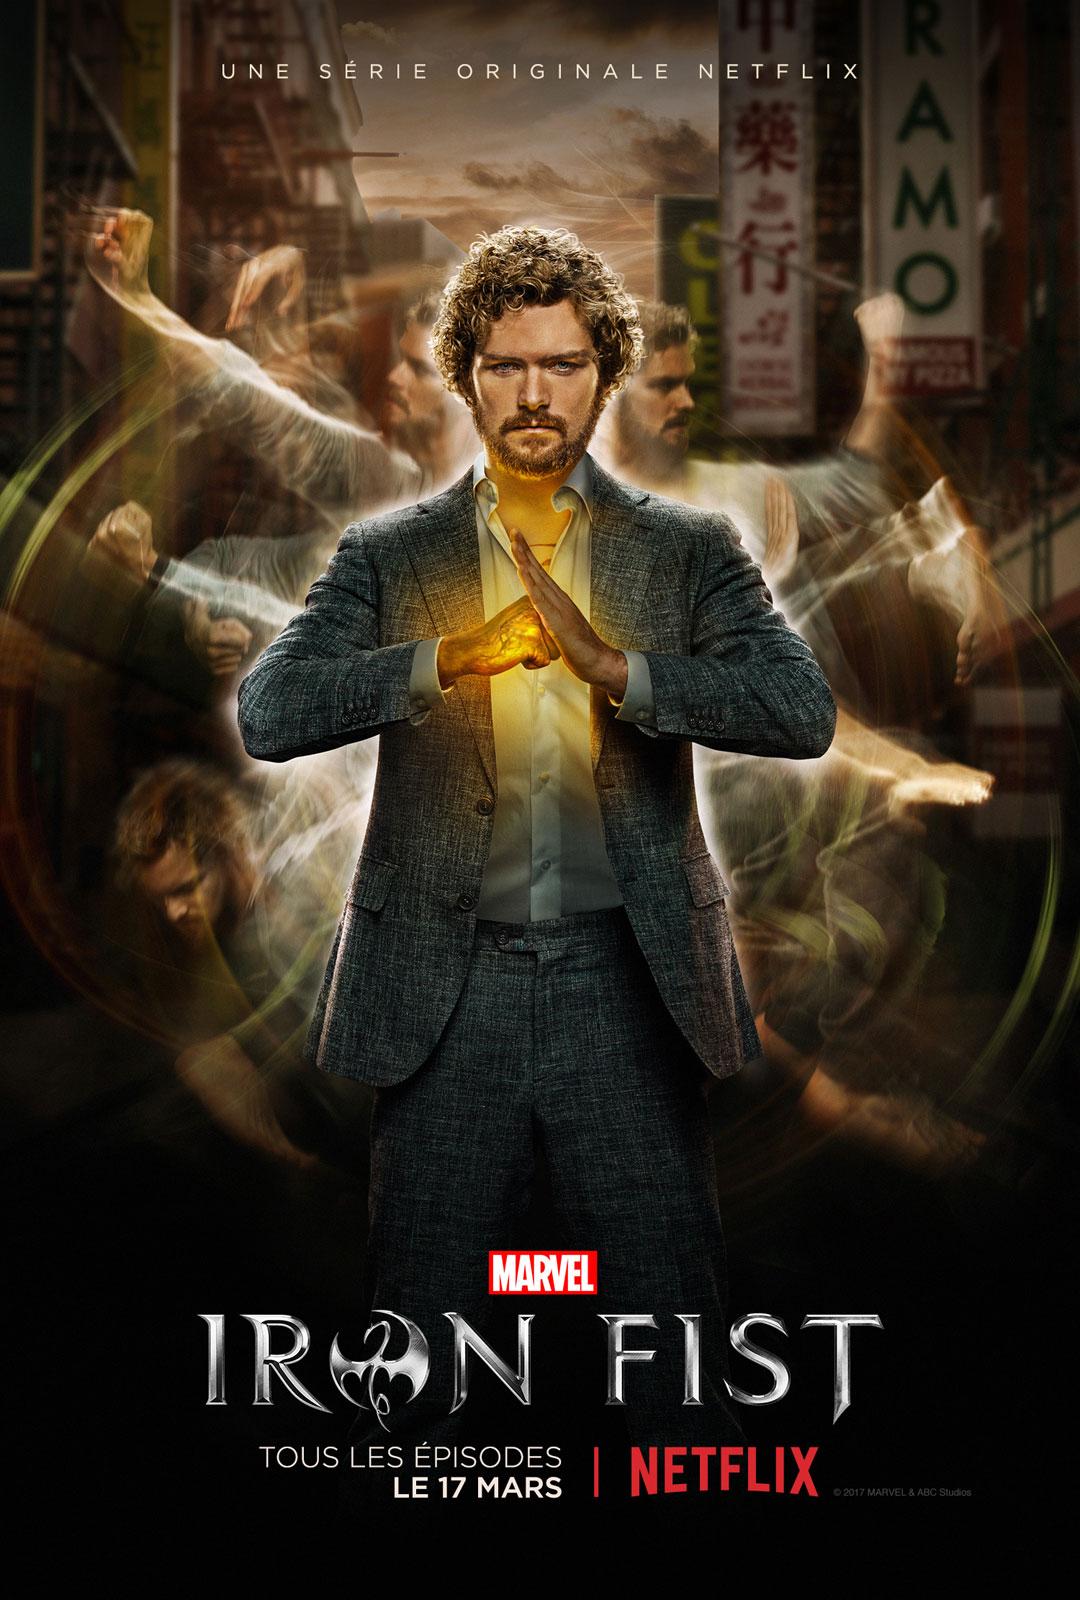 Marvel's Iron Fist Saison 1 - AlloCiné